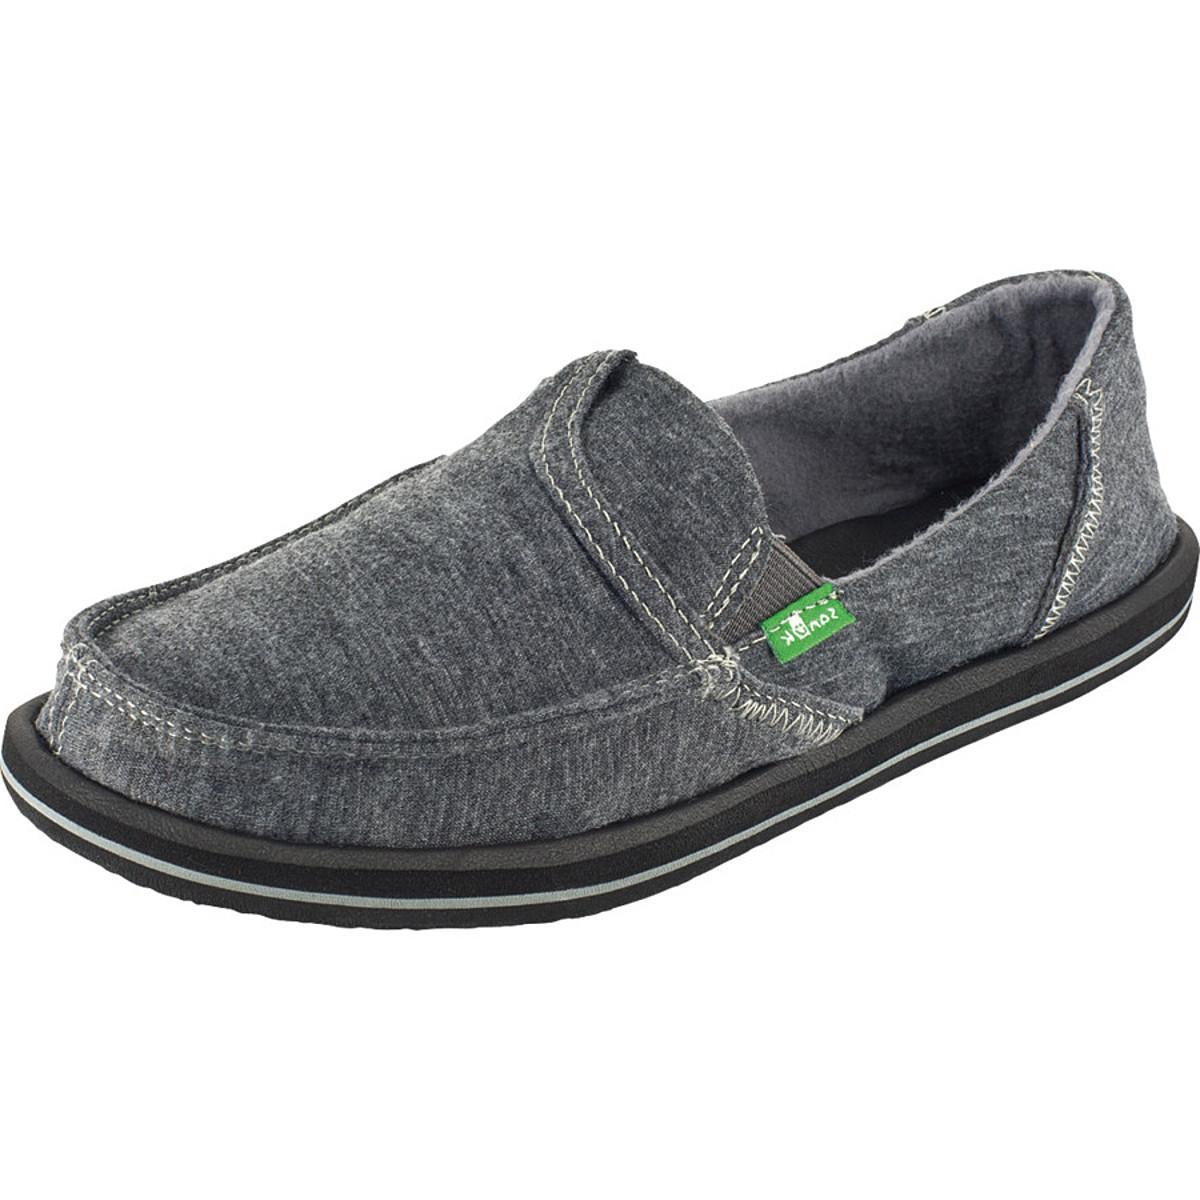 Sanuk Pick Pocket Fleece Shoe - Women's Charcoal, 10.0